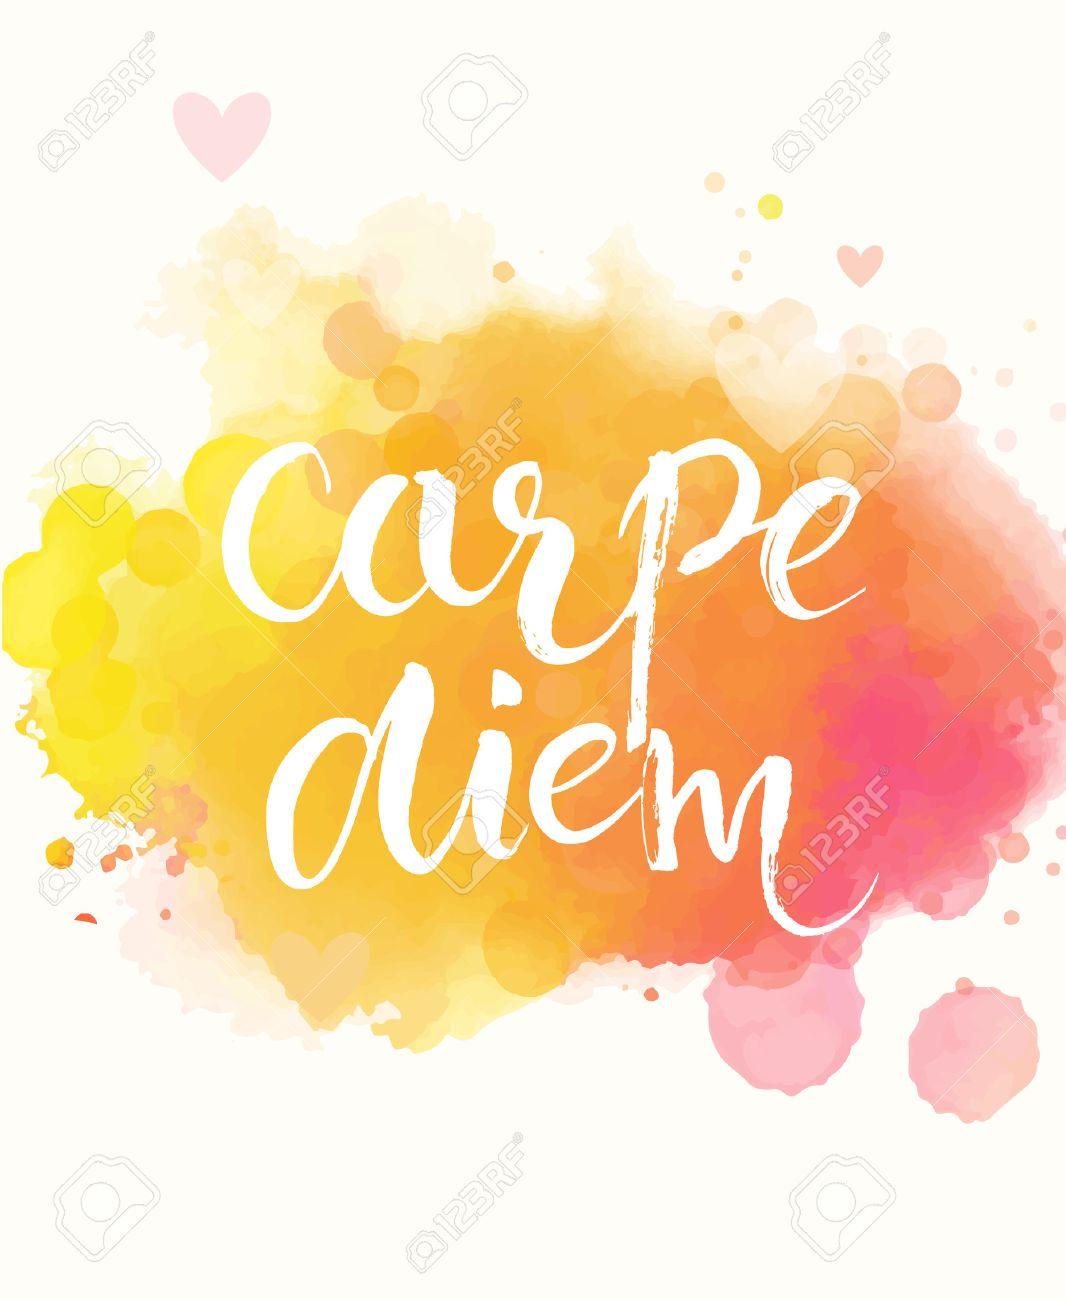 carpe diem meaning